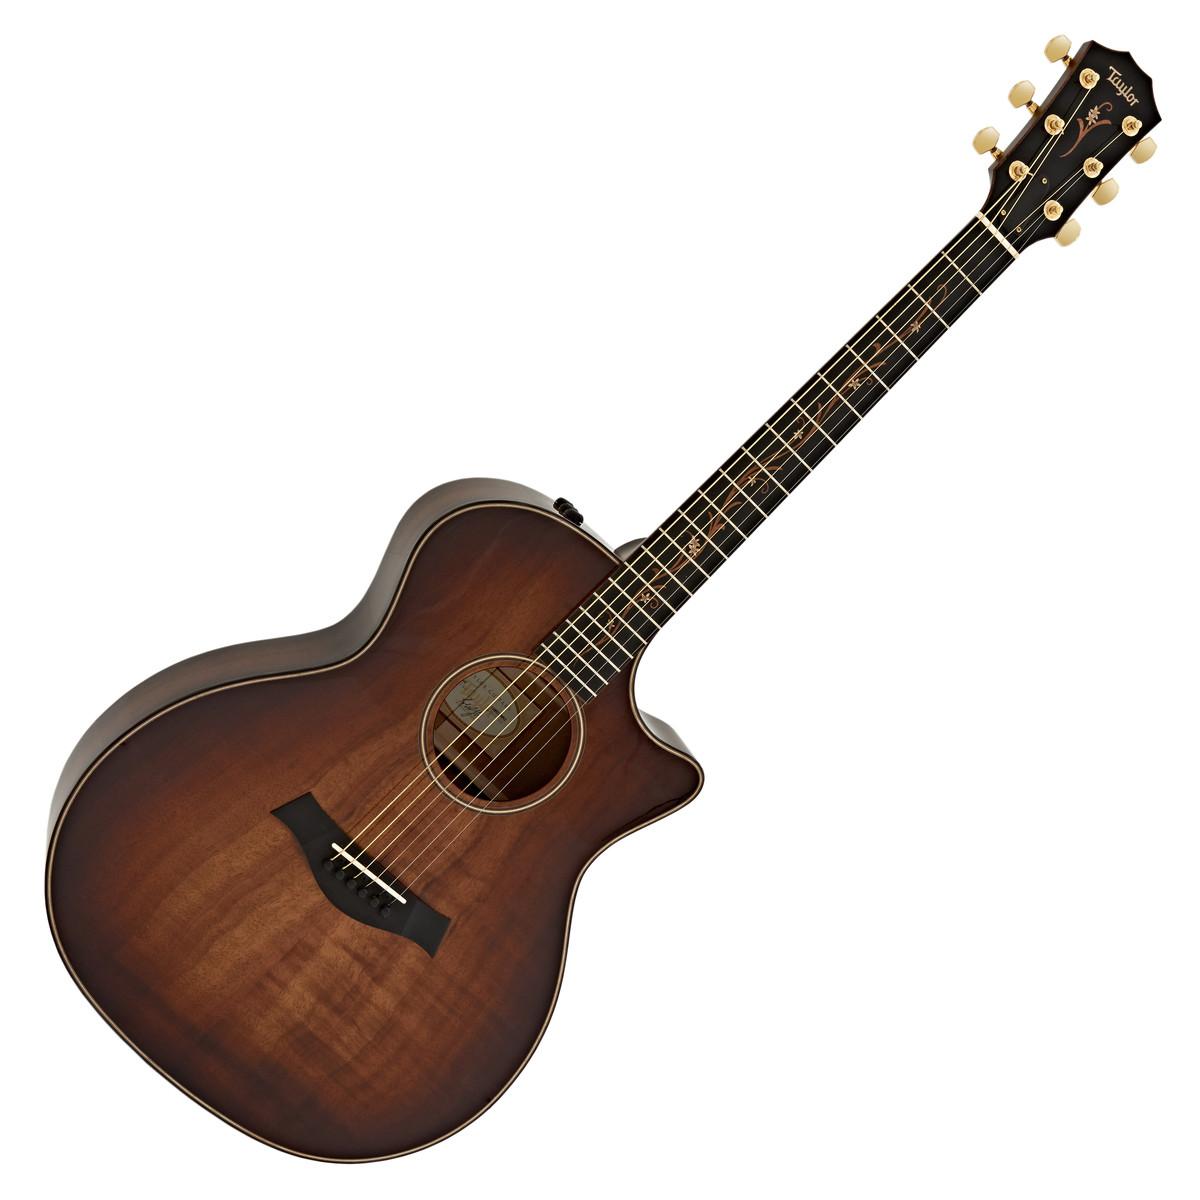 Taylor K24ce Koa Grand Auditorium Electro Acoustic Guitar ...